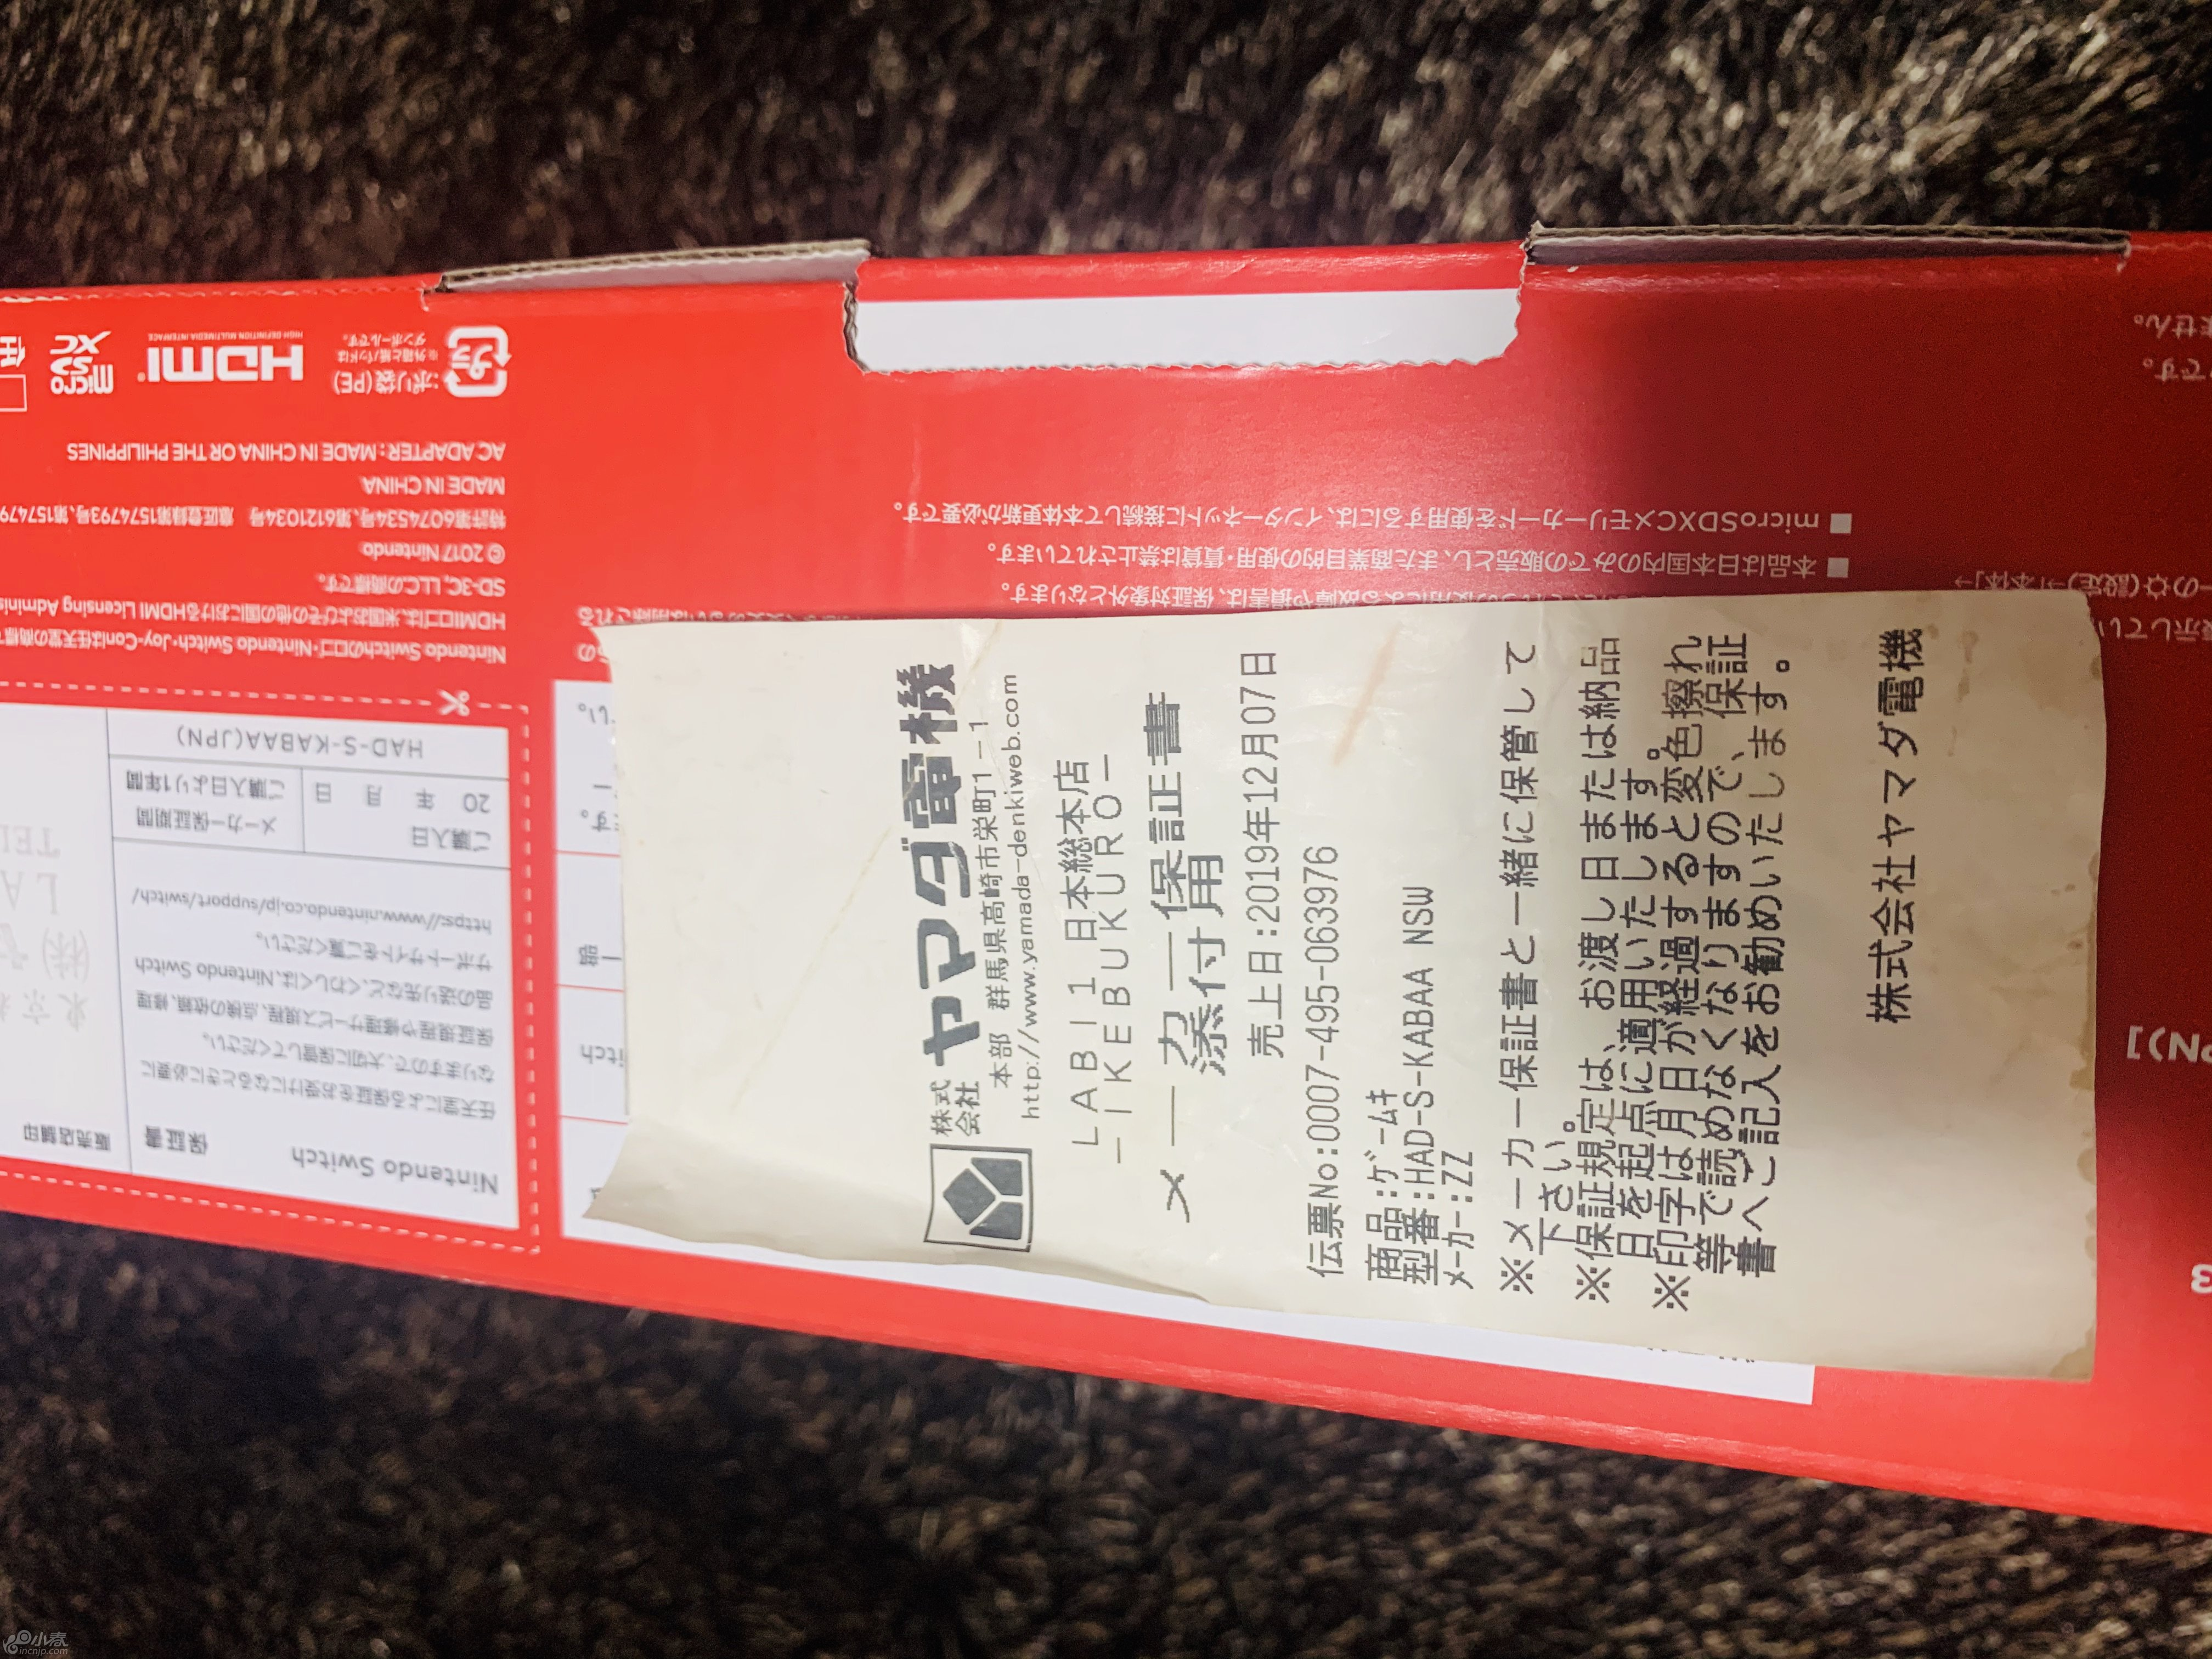 F64717C5-DBE2-49E6-86FF-A65BB0D9560E.jpeg